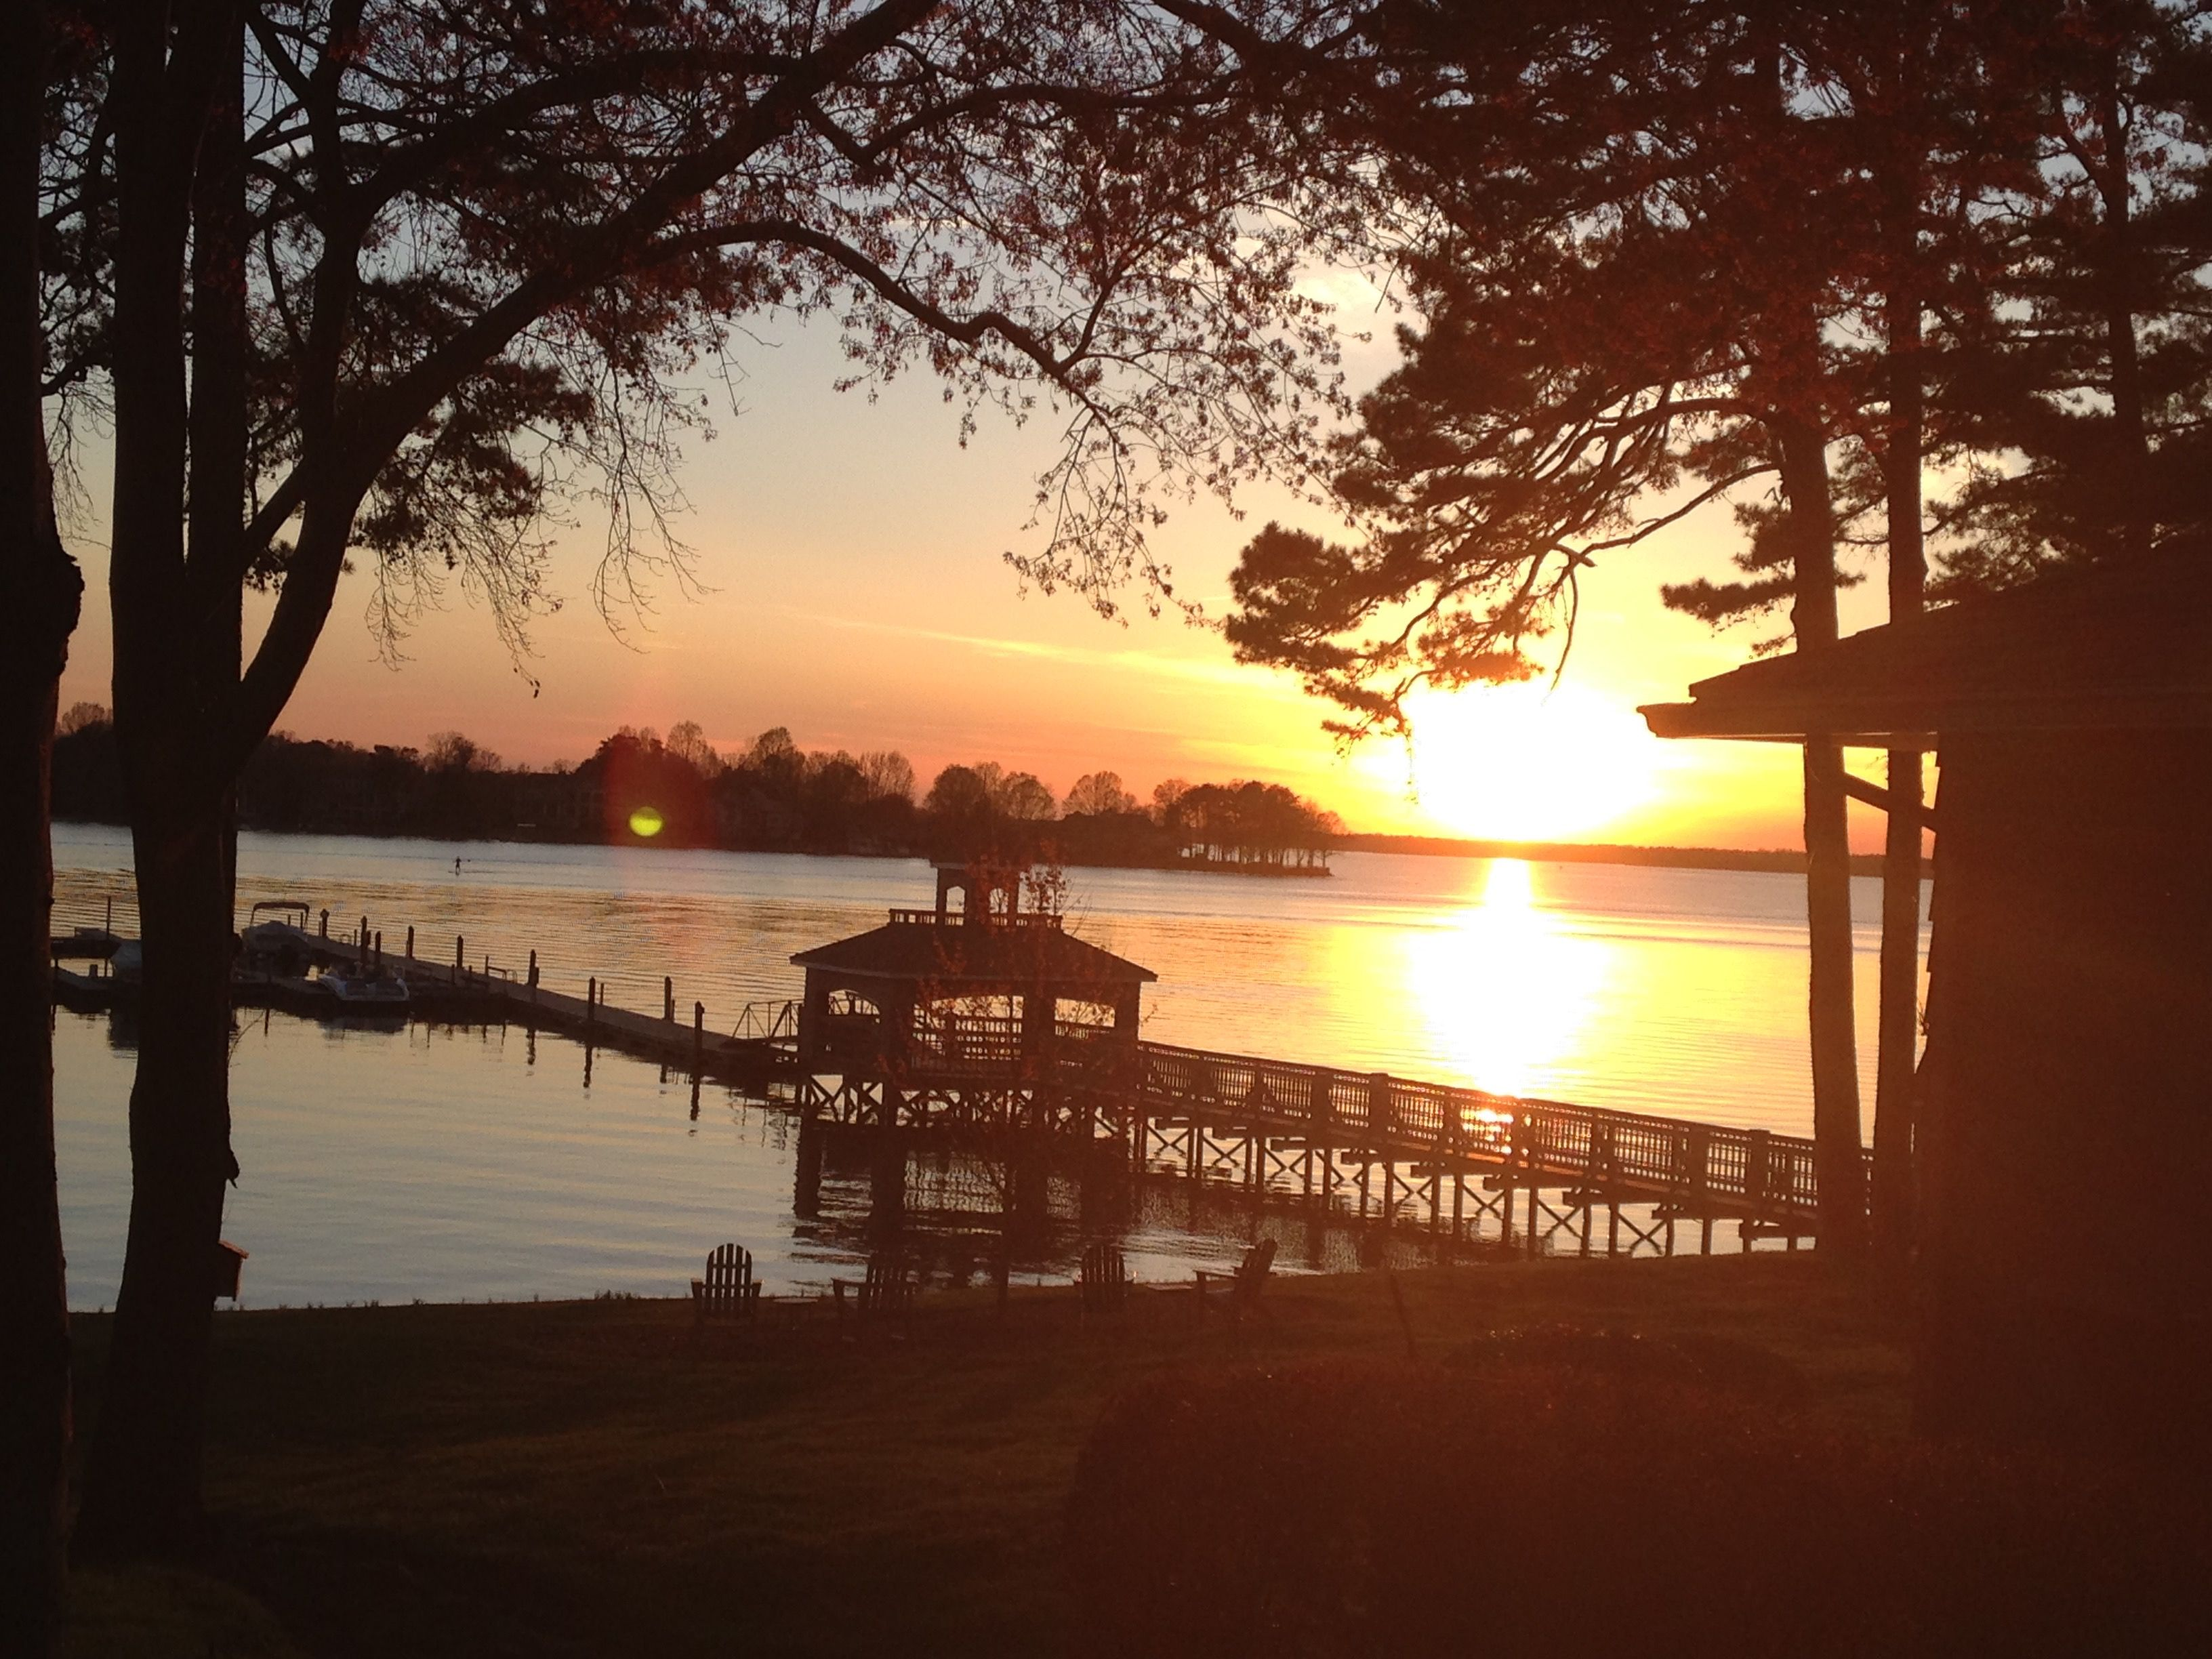 Lake Norman Sunsets